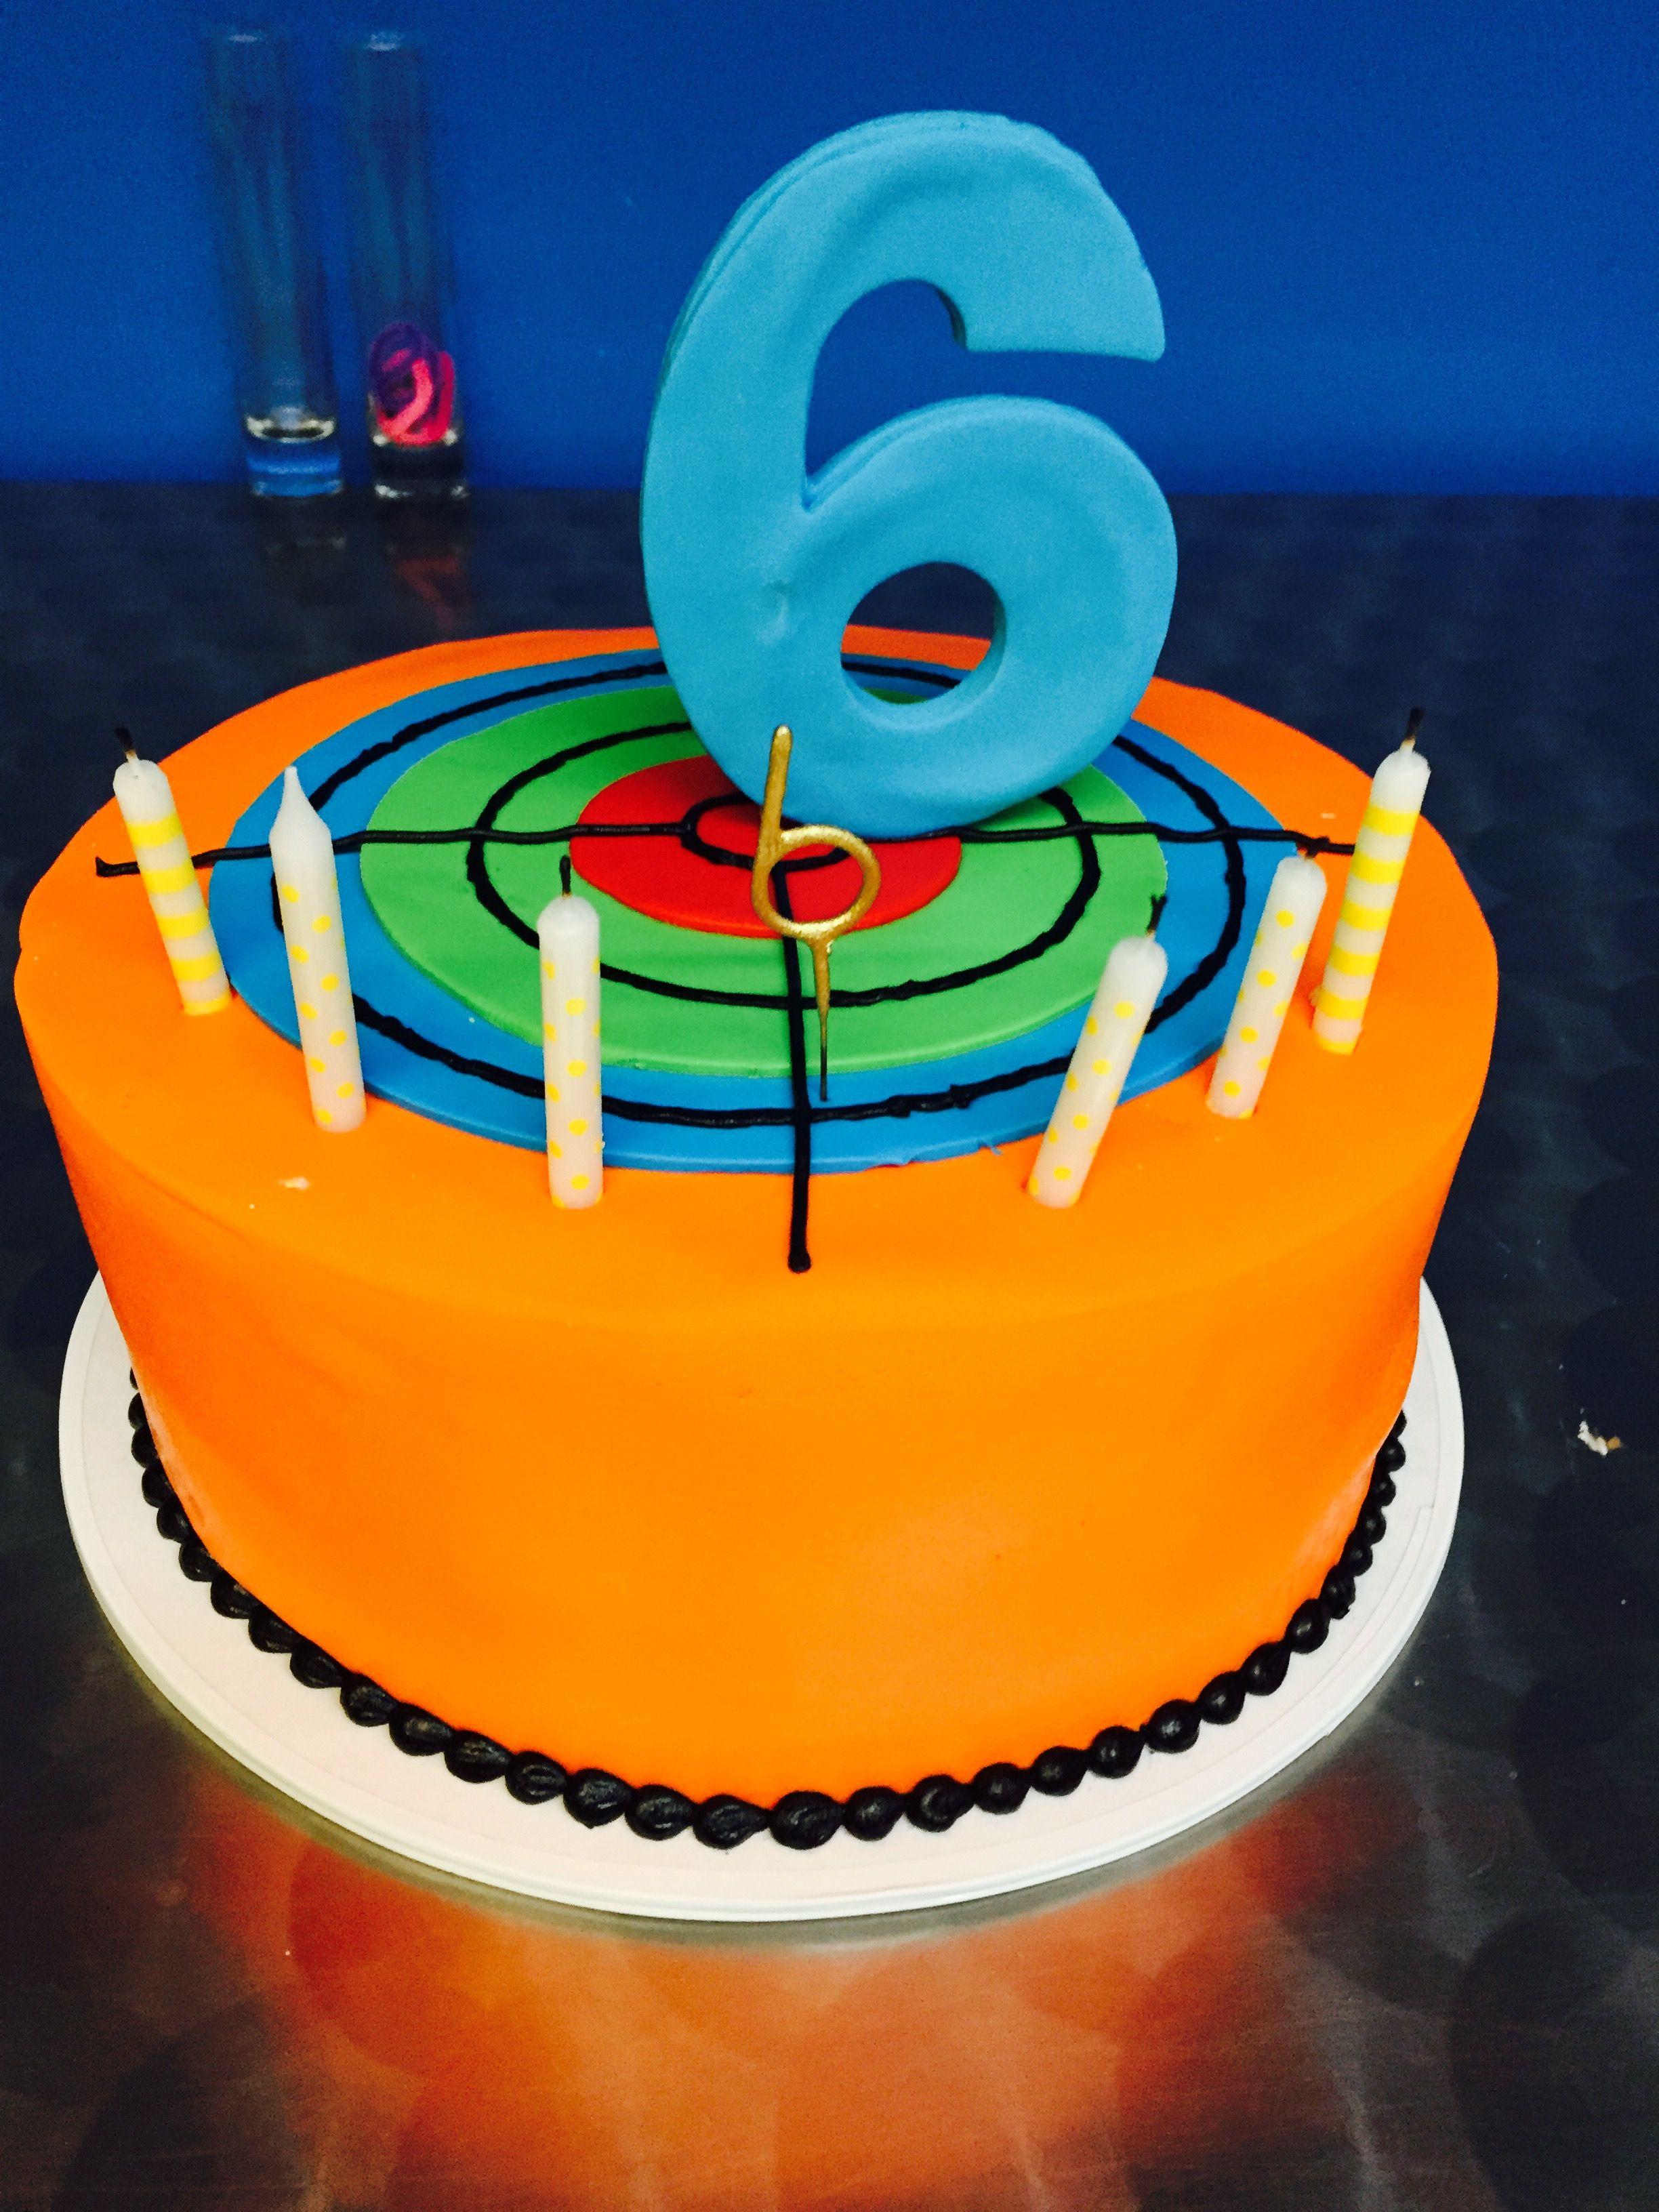 Laser tag target cake birthday Pinterest Birthdays Laser tag